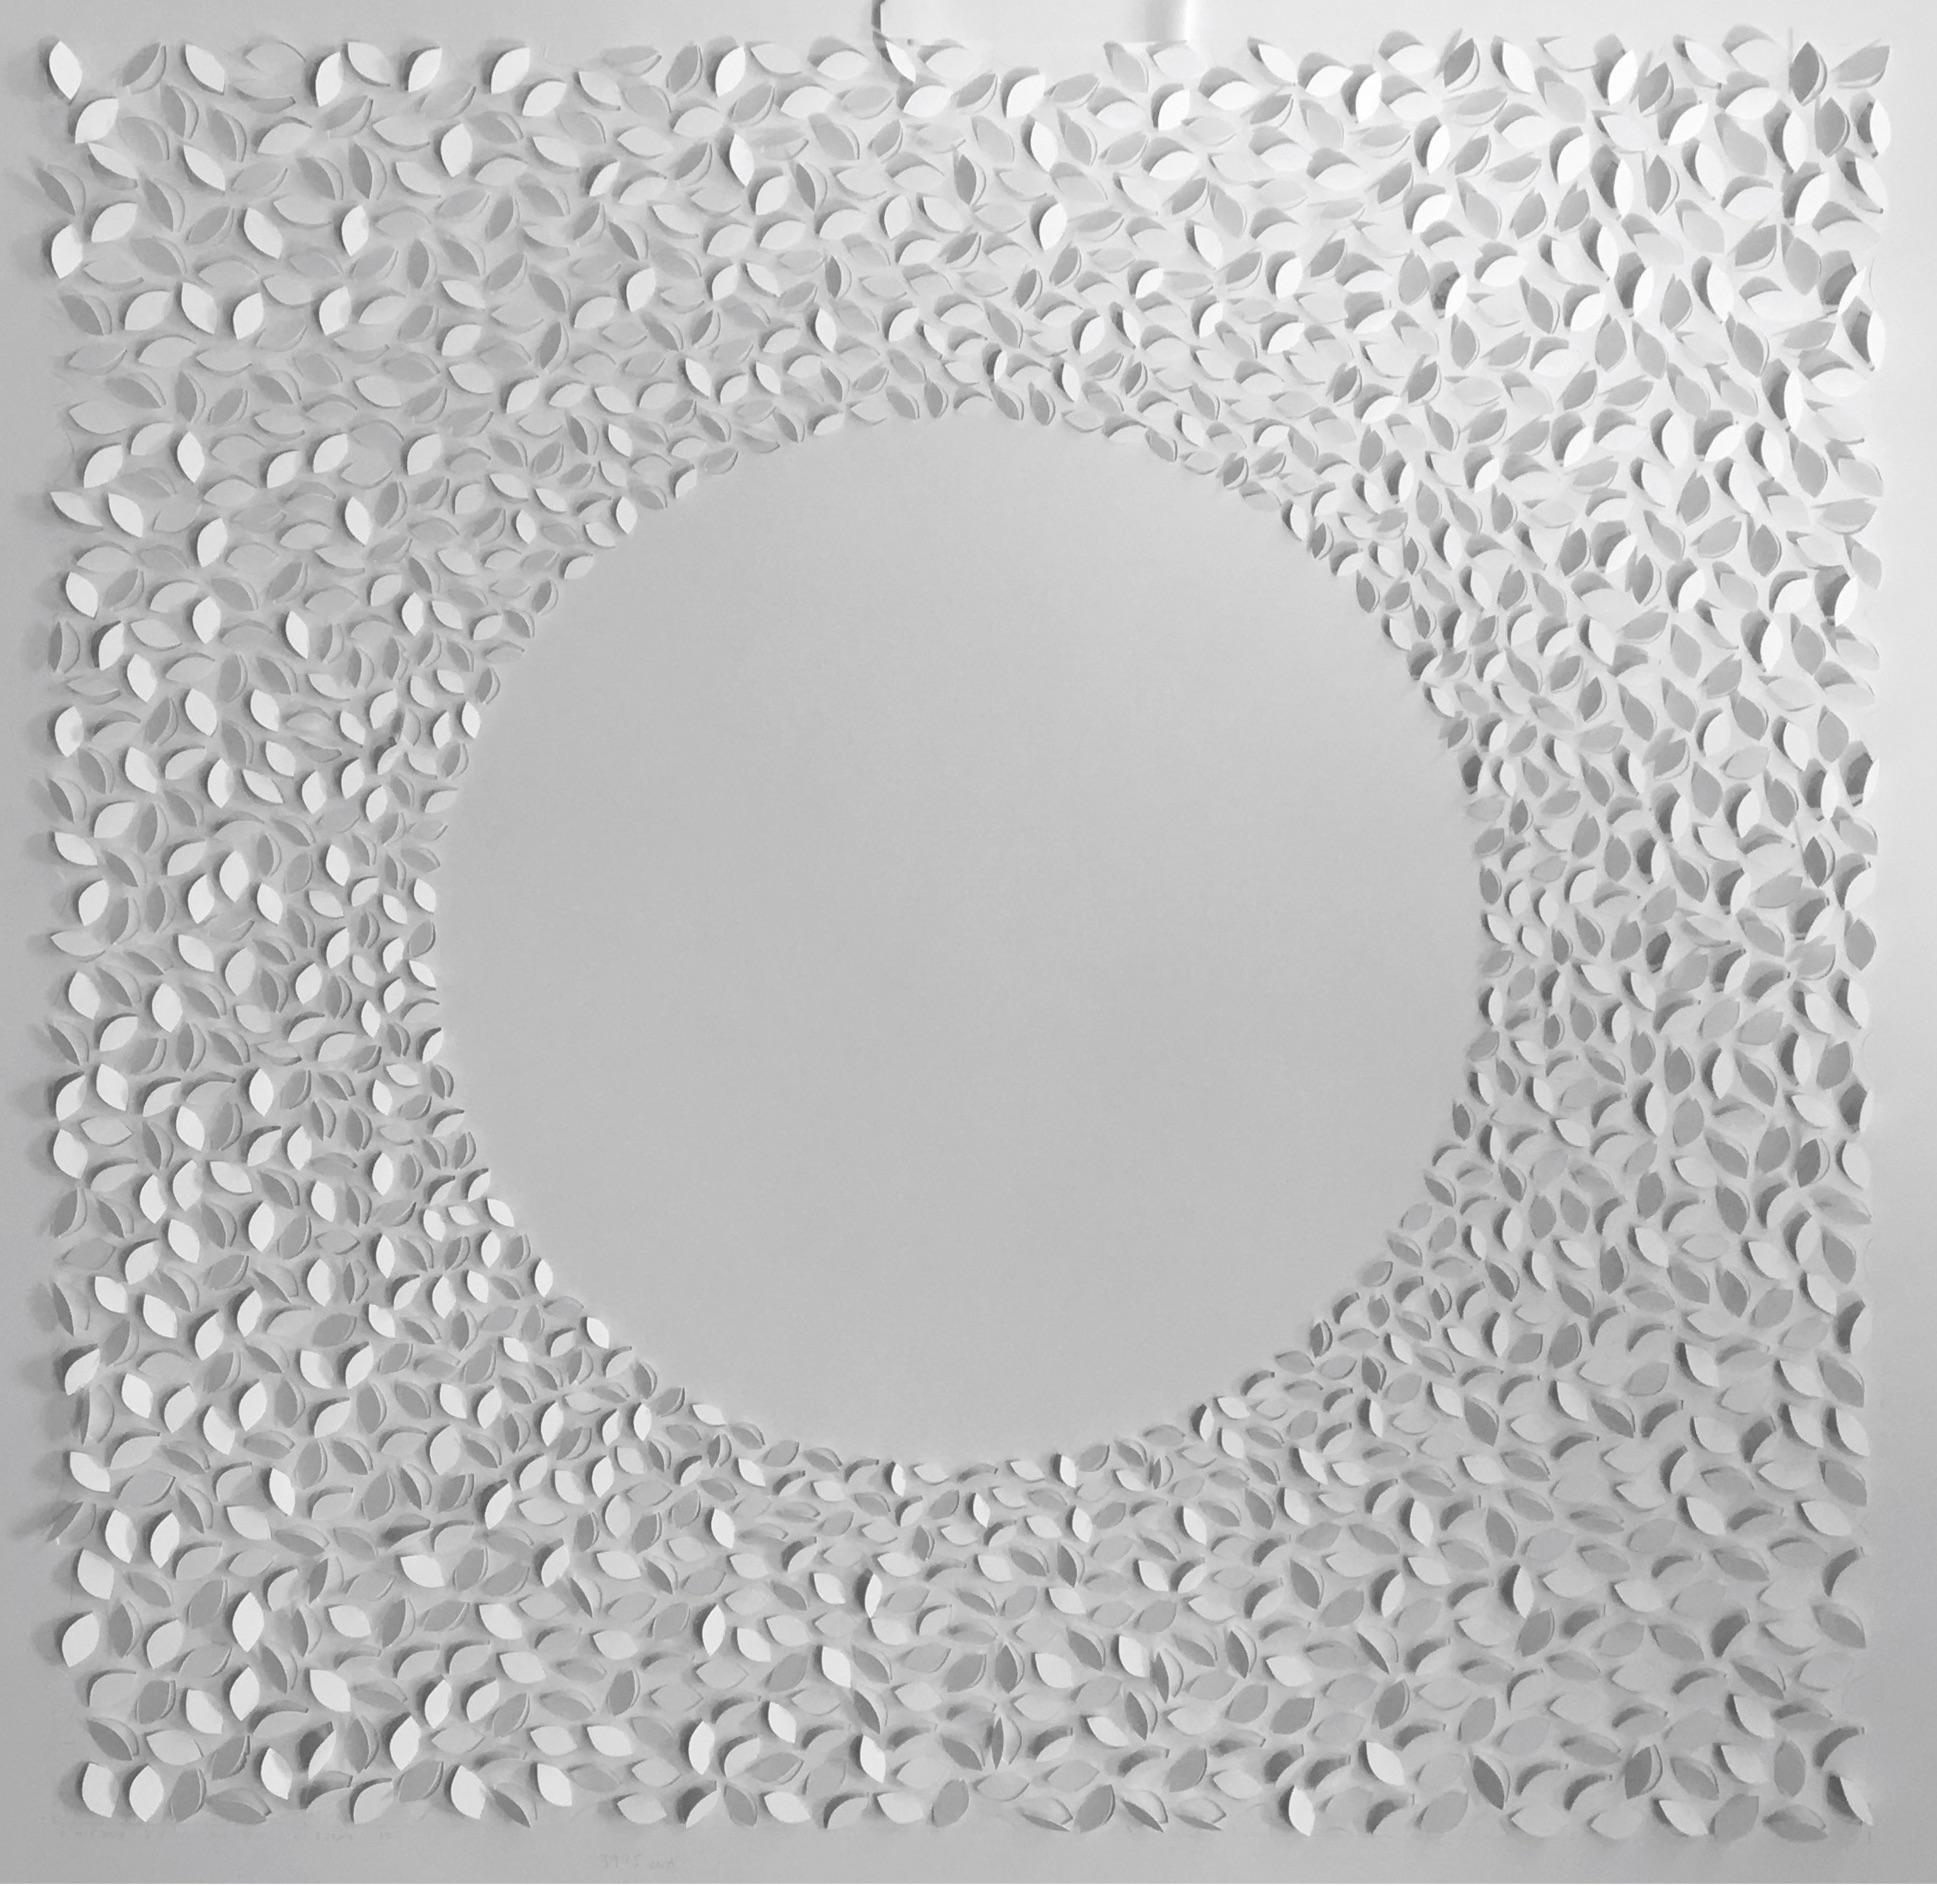 Jaq Belcher,  Solar Series II, 2016, Hand-cut paper, 3,975 cuts, 37 x 37 inches